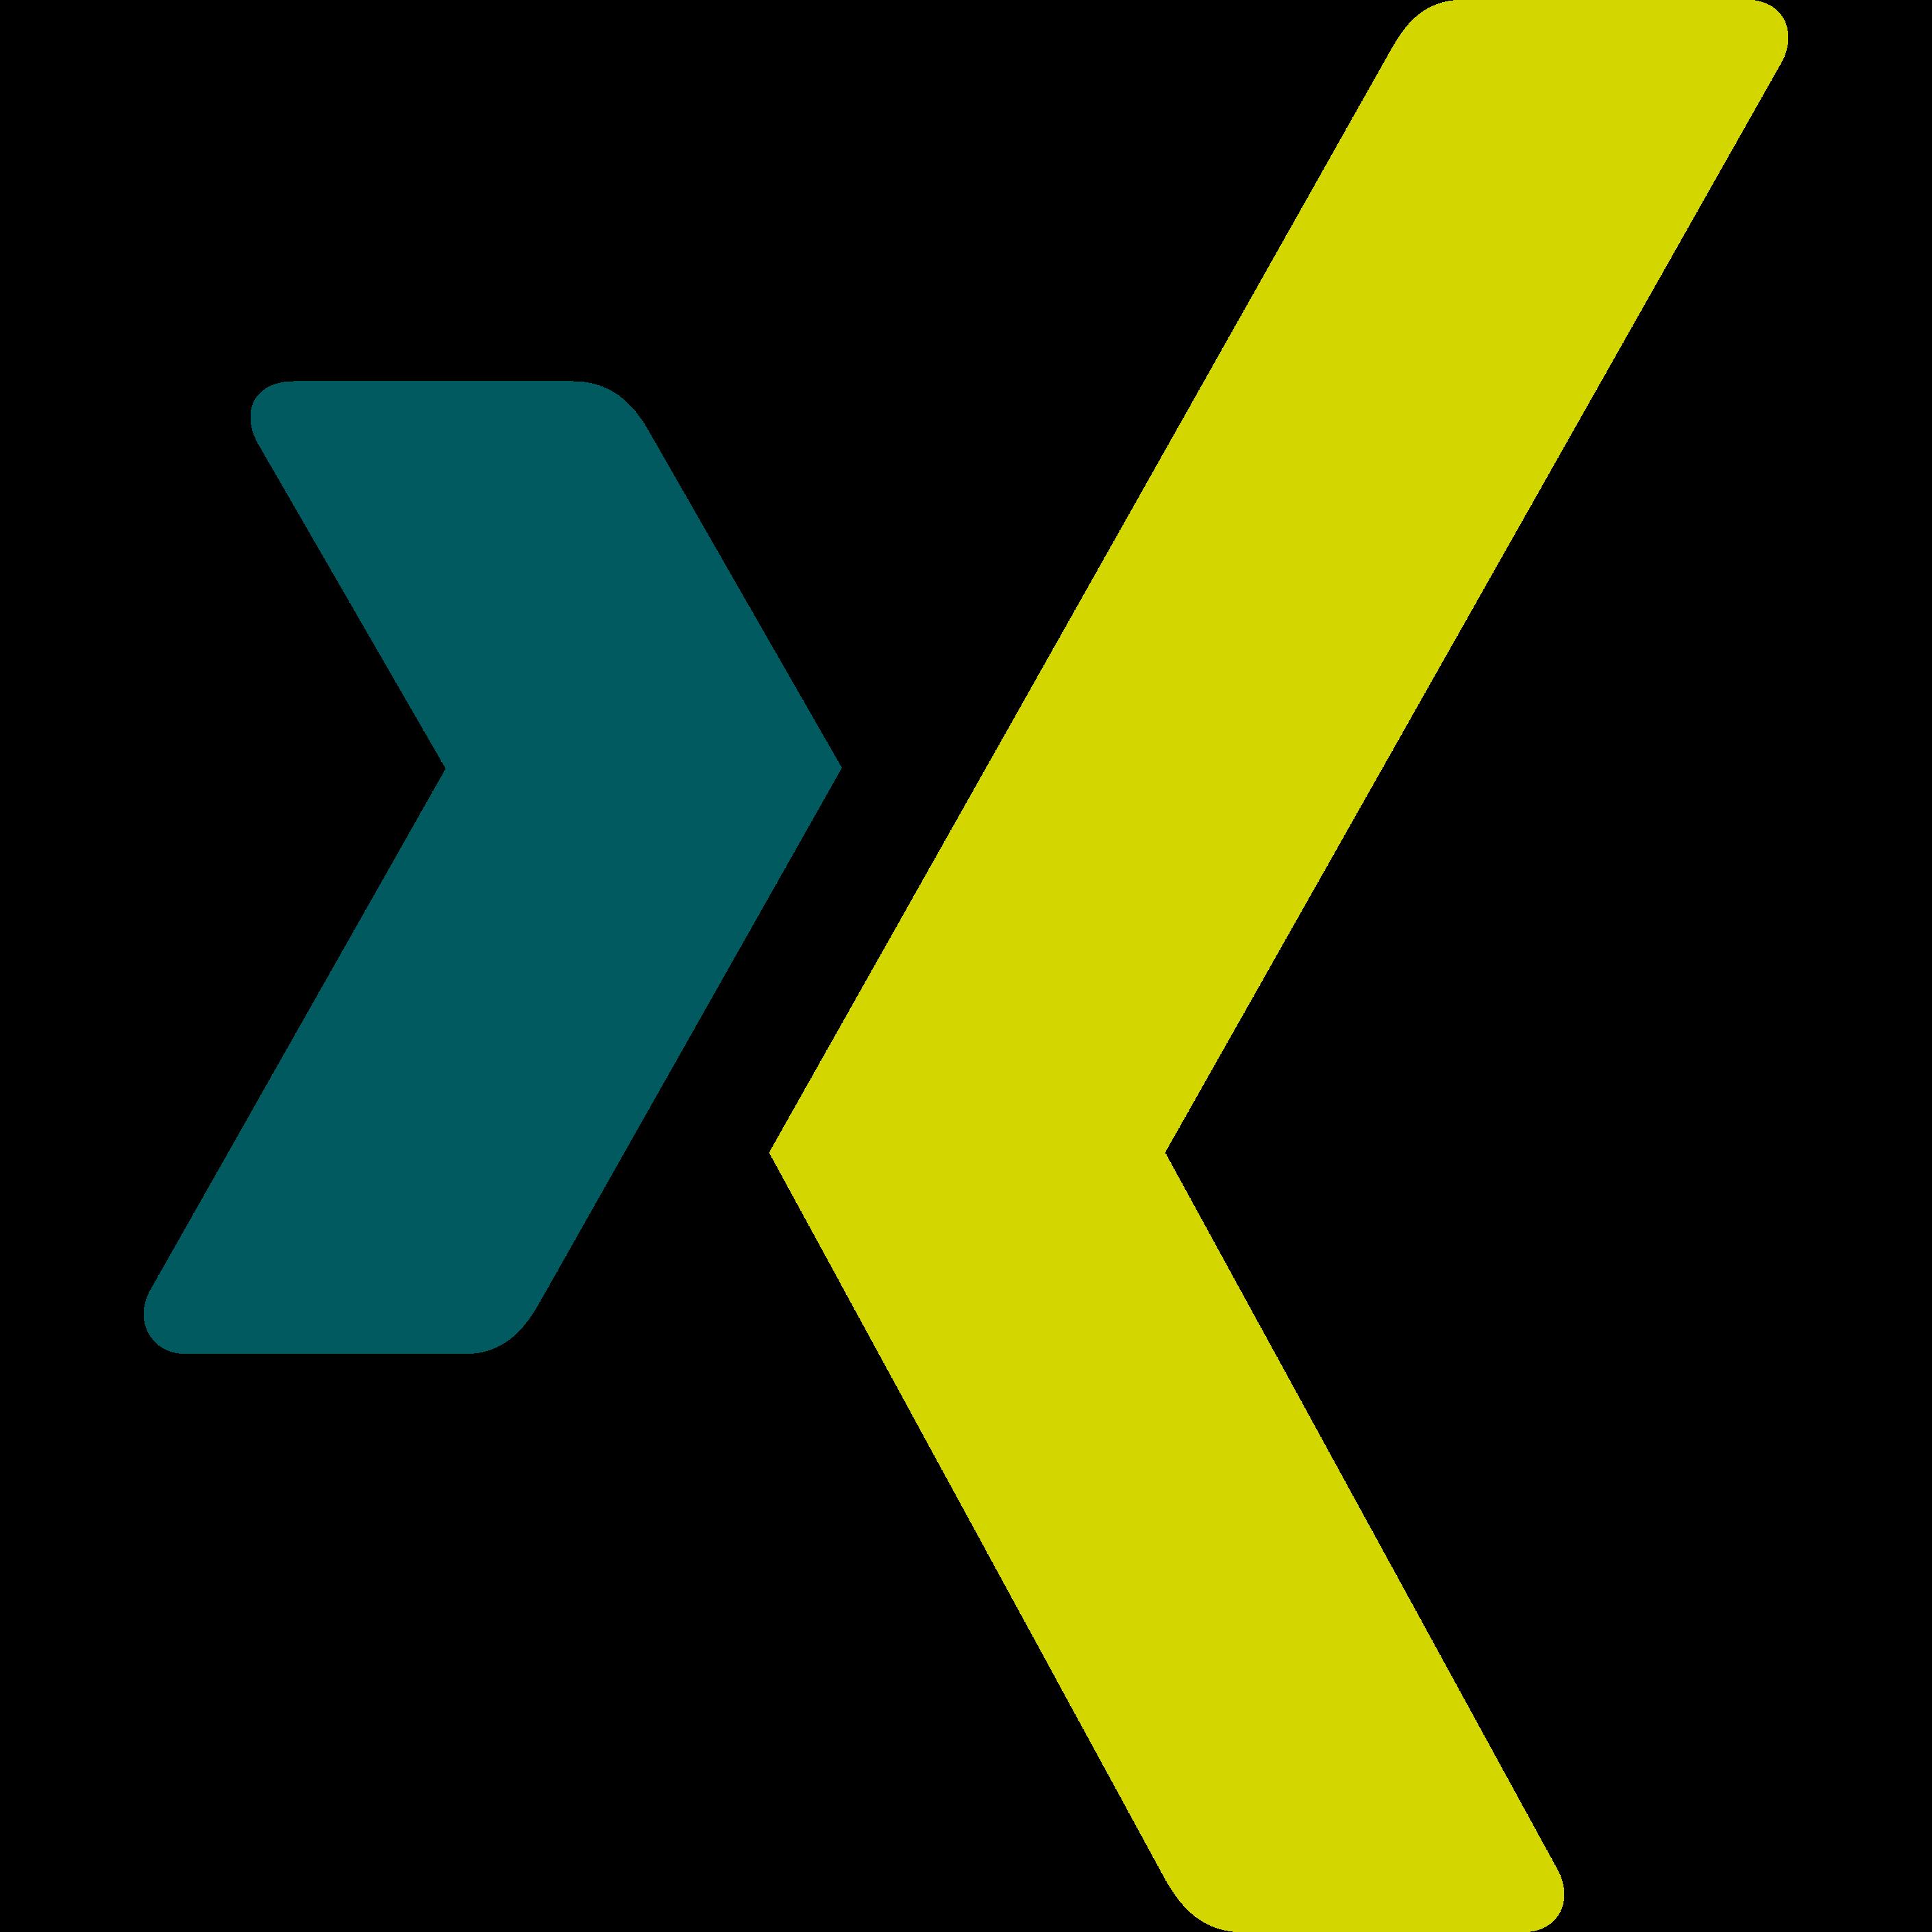 XING - fundamentale Aktienanalyse